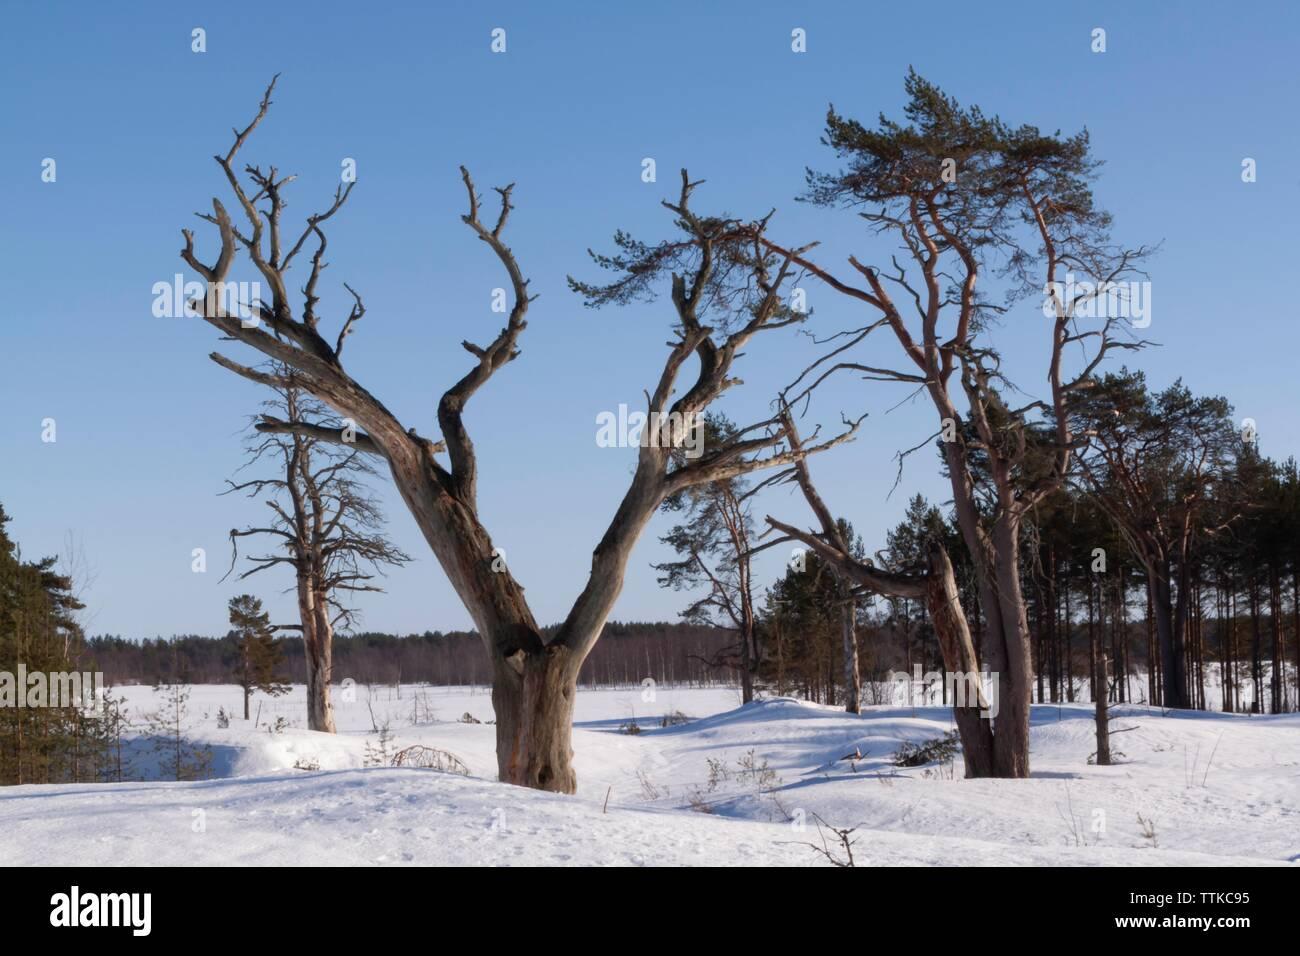 Forest area with dead trees, Hailuoto Island, North Ostrobothnia, Finland Stock Photo